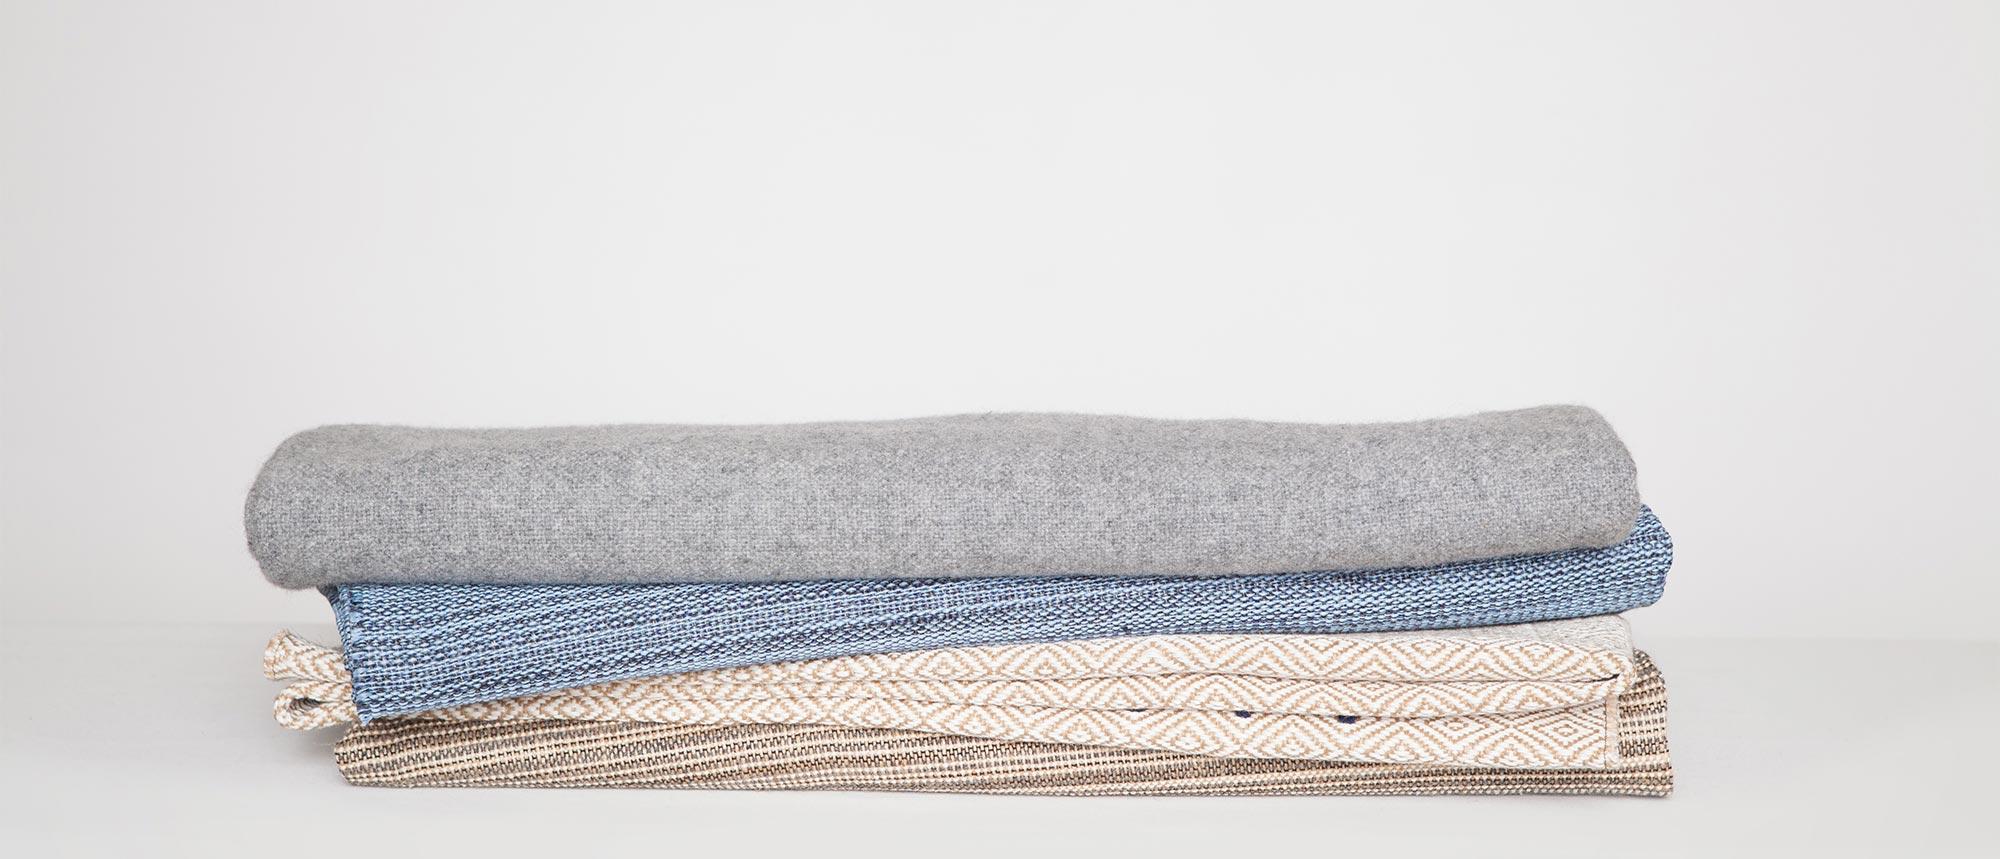 loom-woven textiles